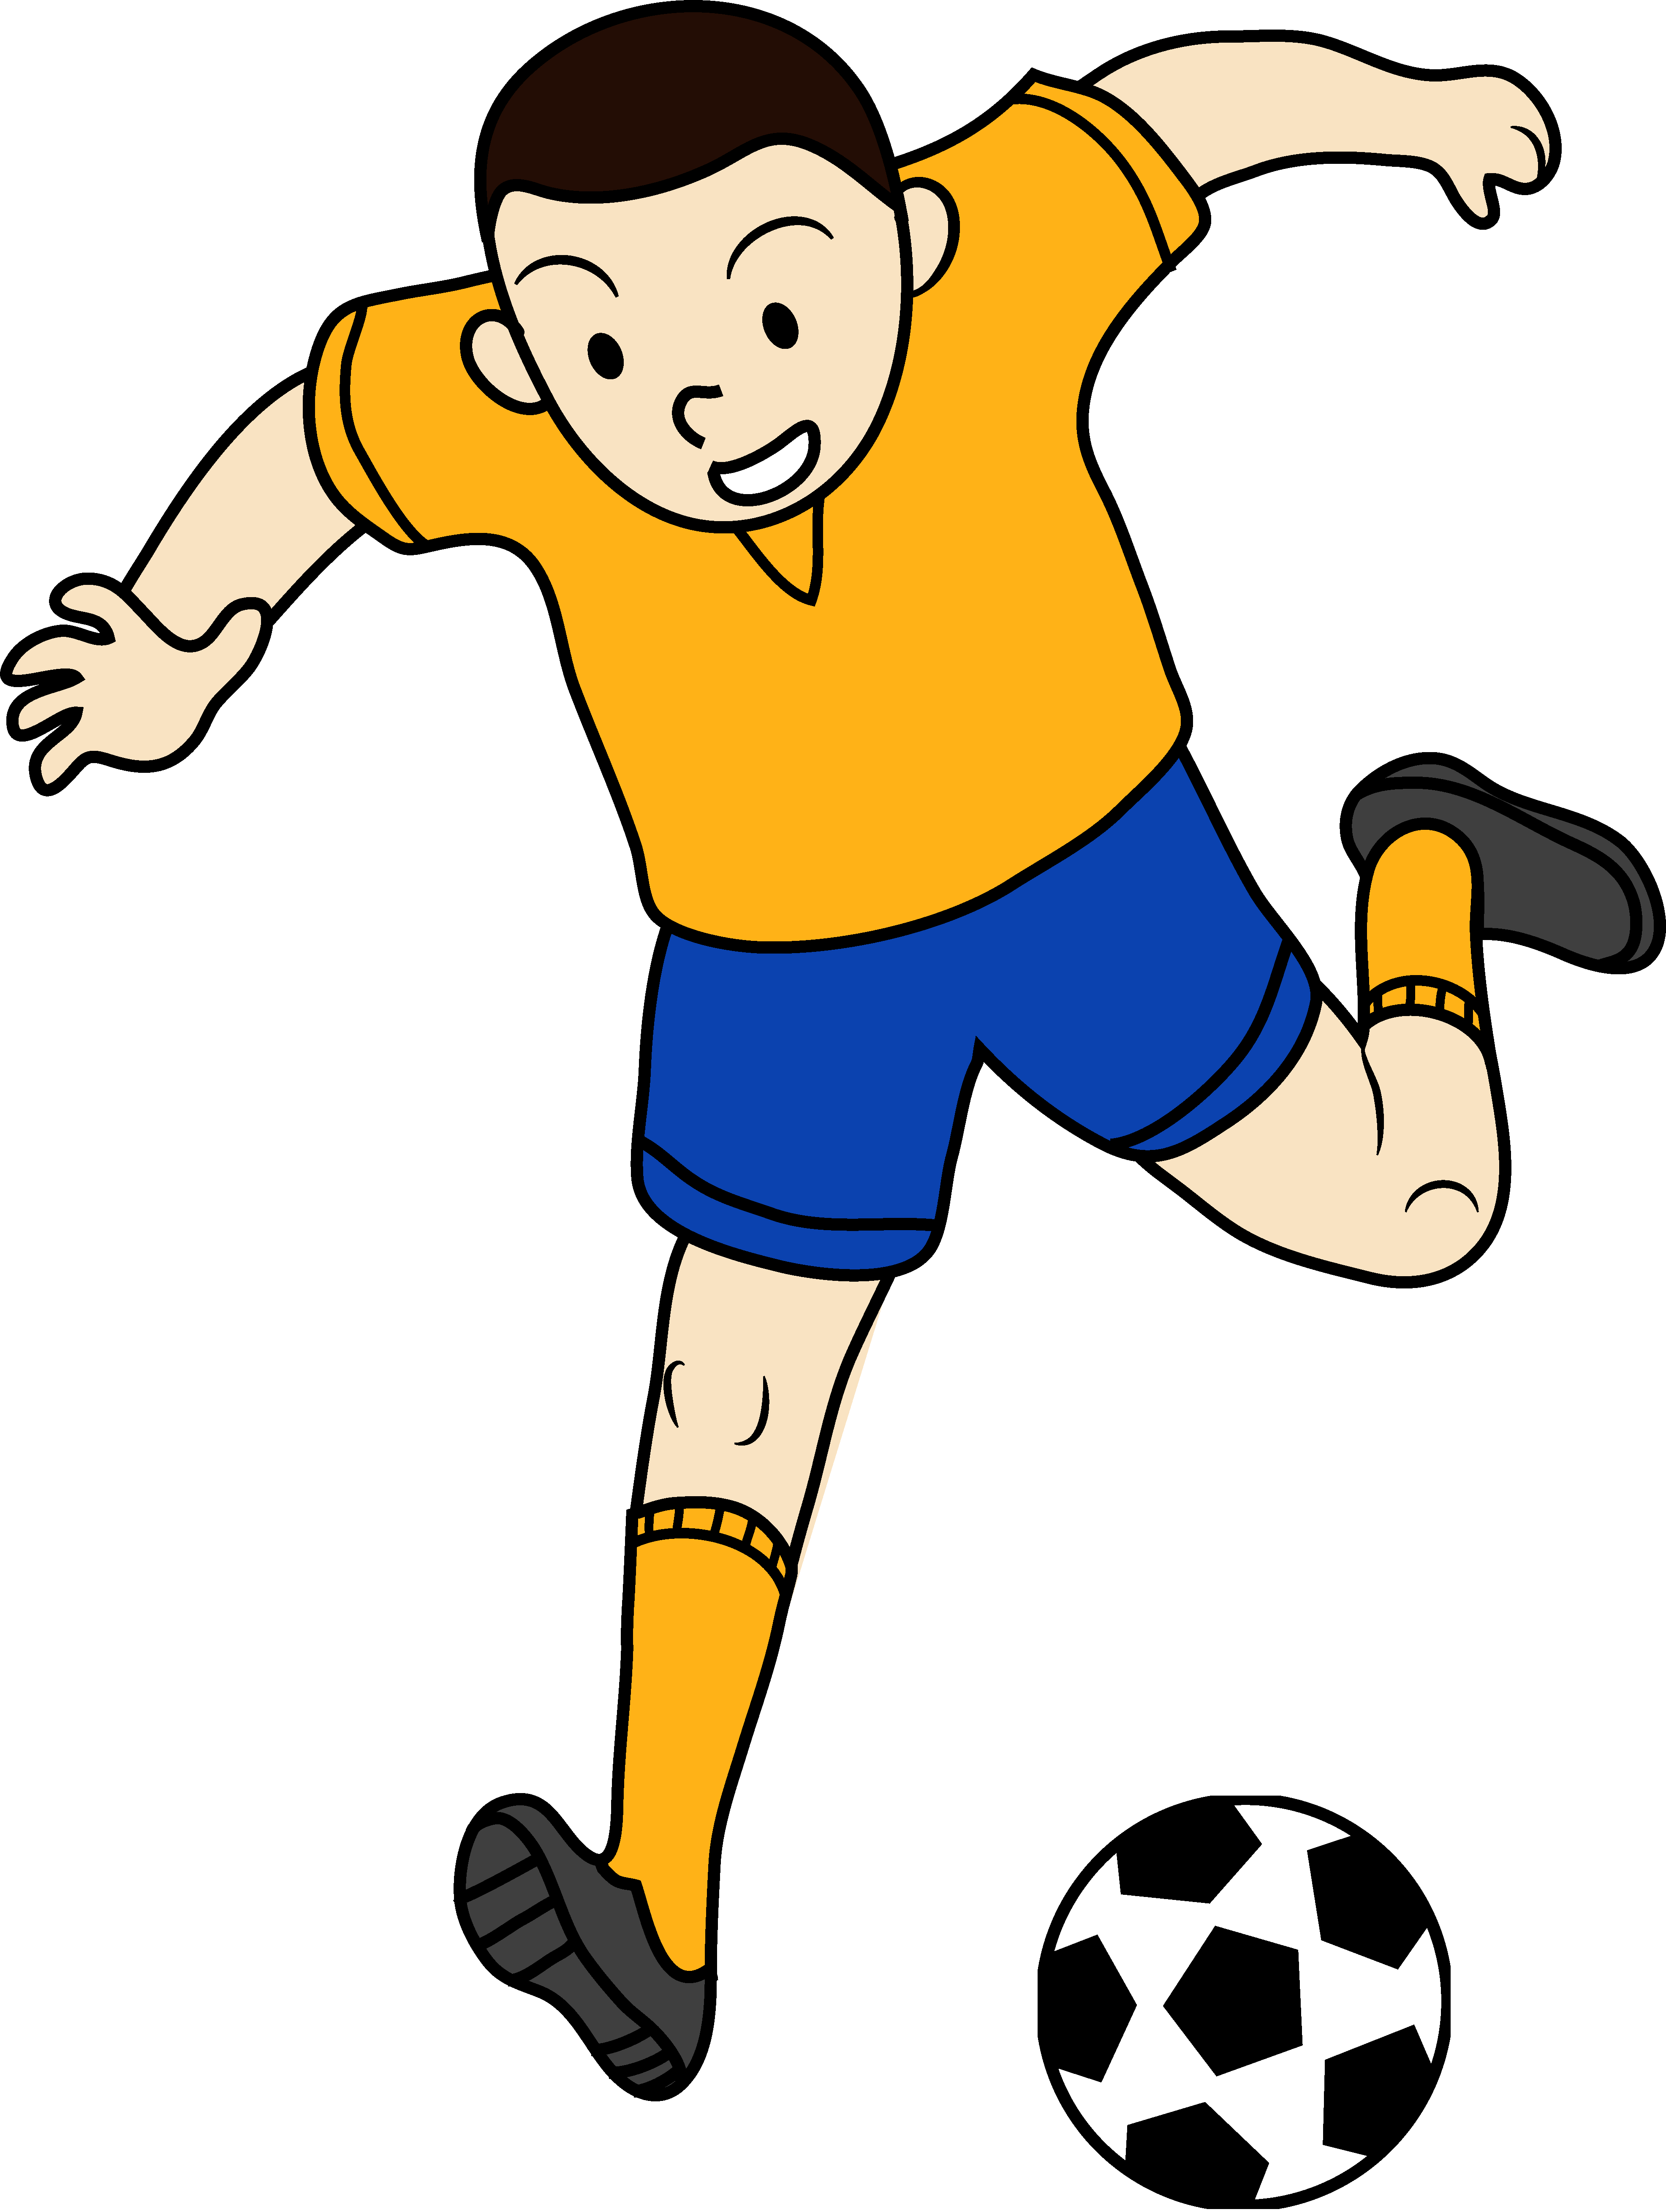 Clip Art Of Kid Playing Soccer Kids Playing Sports Football Kids Kids Playing